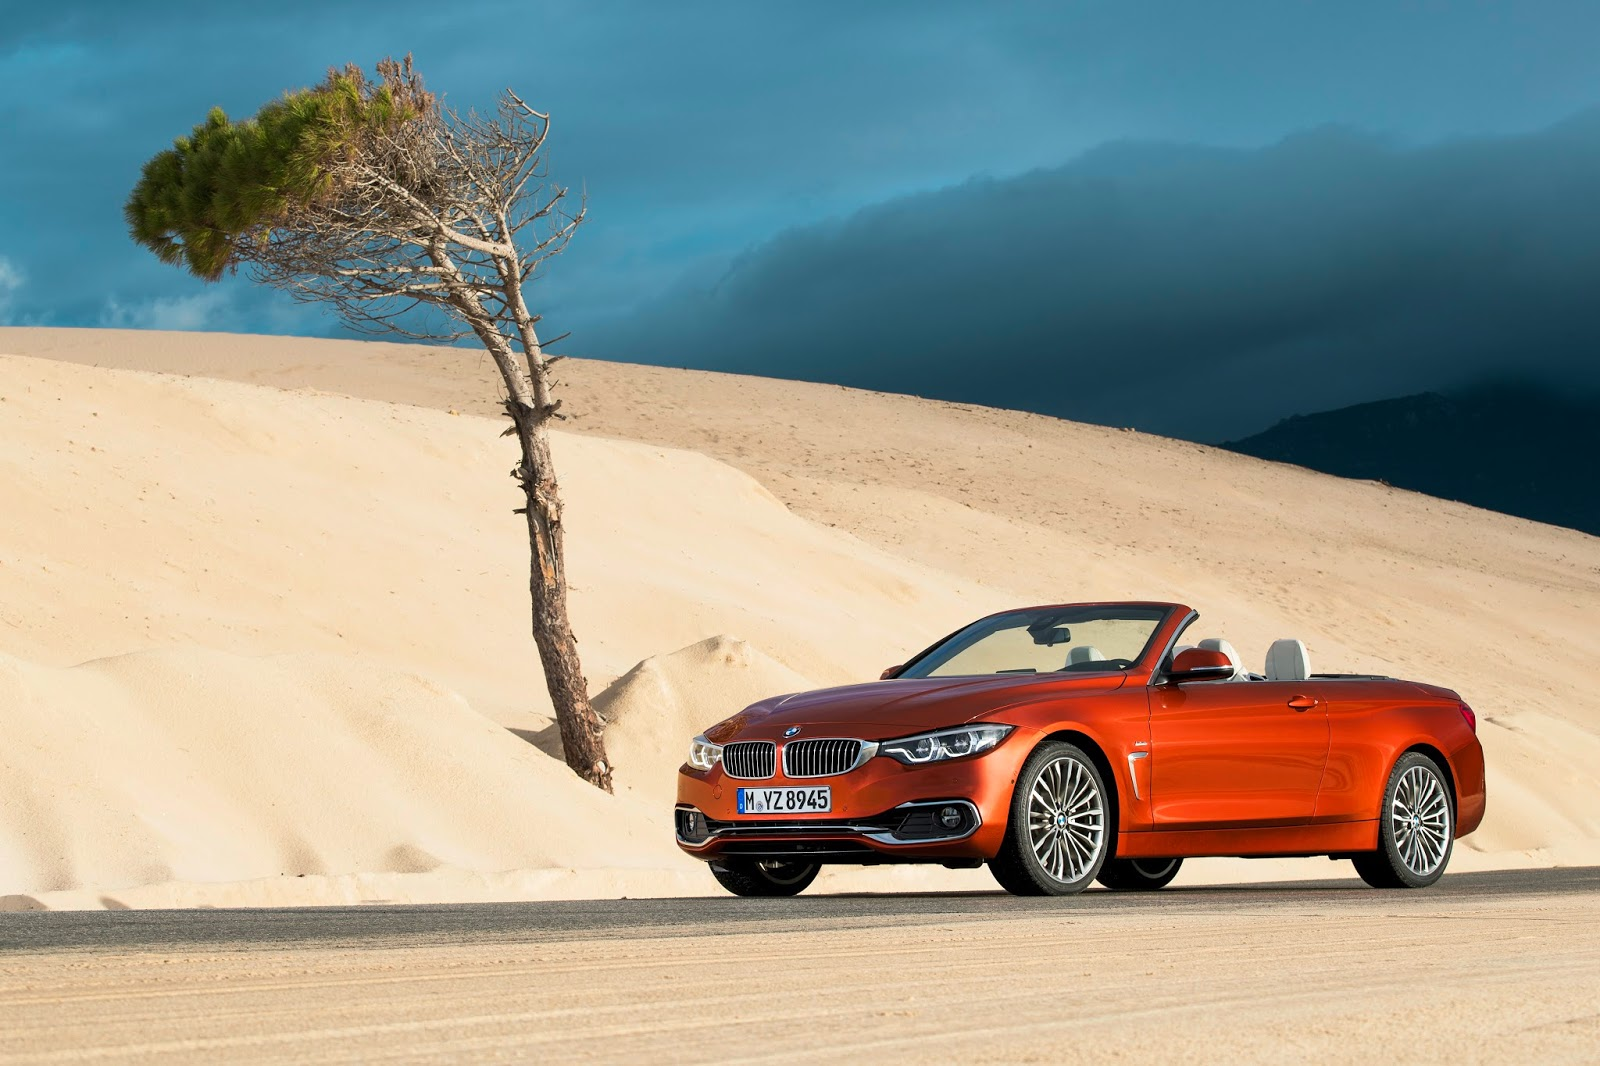 P90245254 highRes bmw 4 series luxury Η νέα BMW Σειρά 4, με πιο σφιχτή ρύθμιση ανάρτησης BMW, Bmw 4, BMW 4 Cabrio, BMW 4 Coupe, BMW 4 Gran Coupé, Facelift